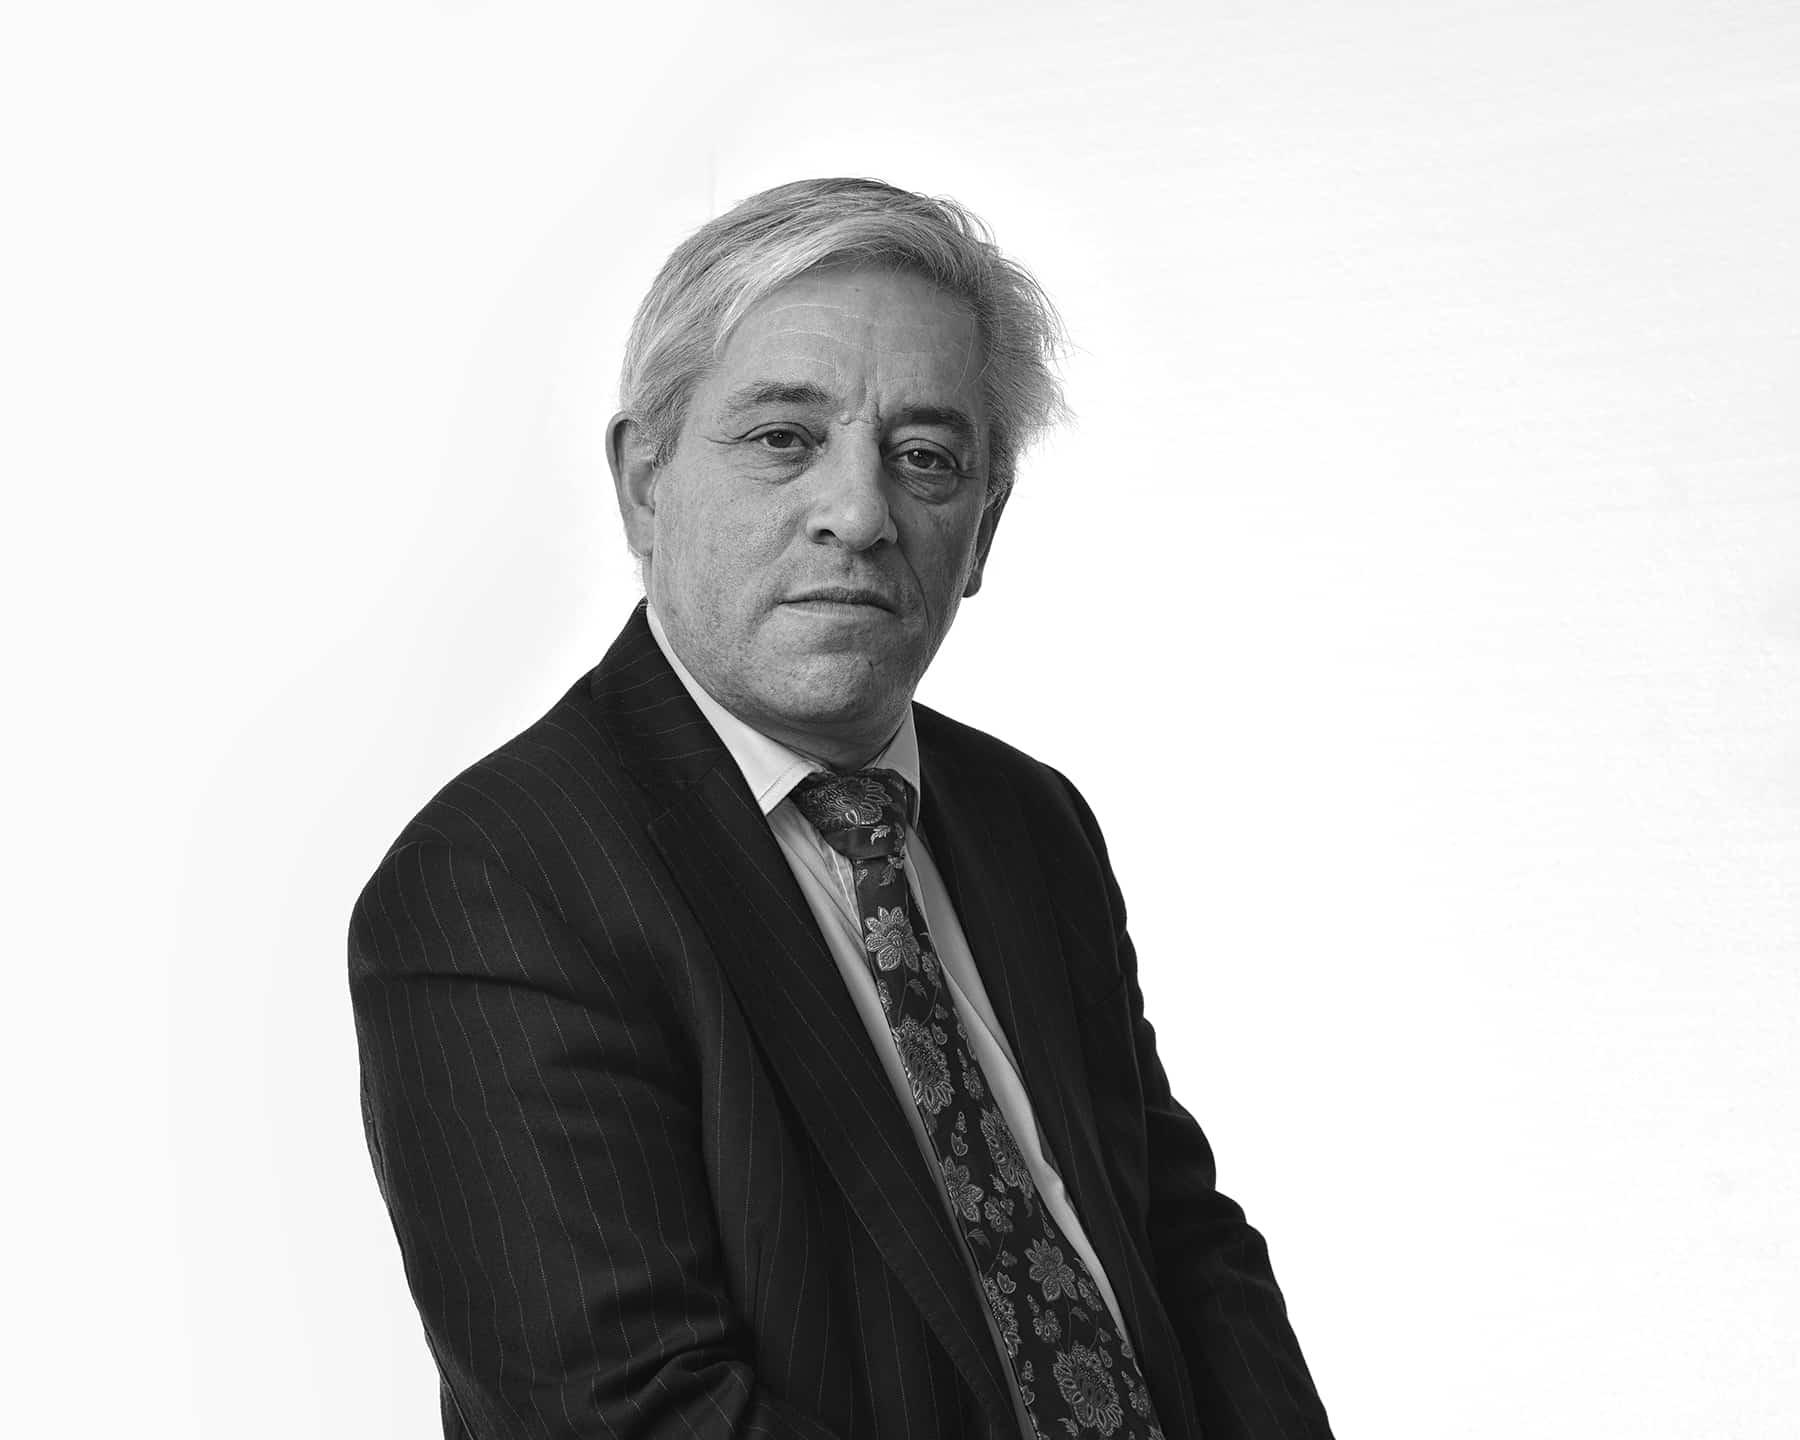 the right honourable john bercow mp - speaker of the house of